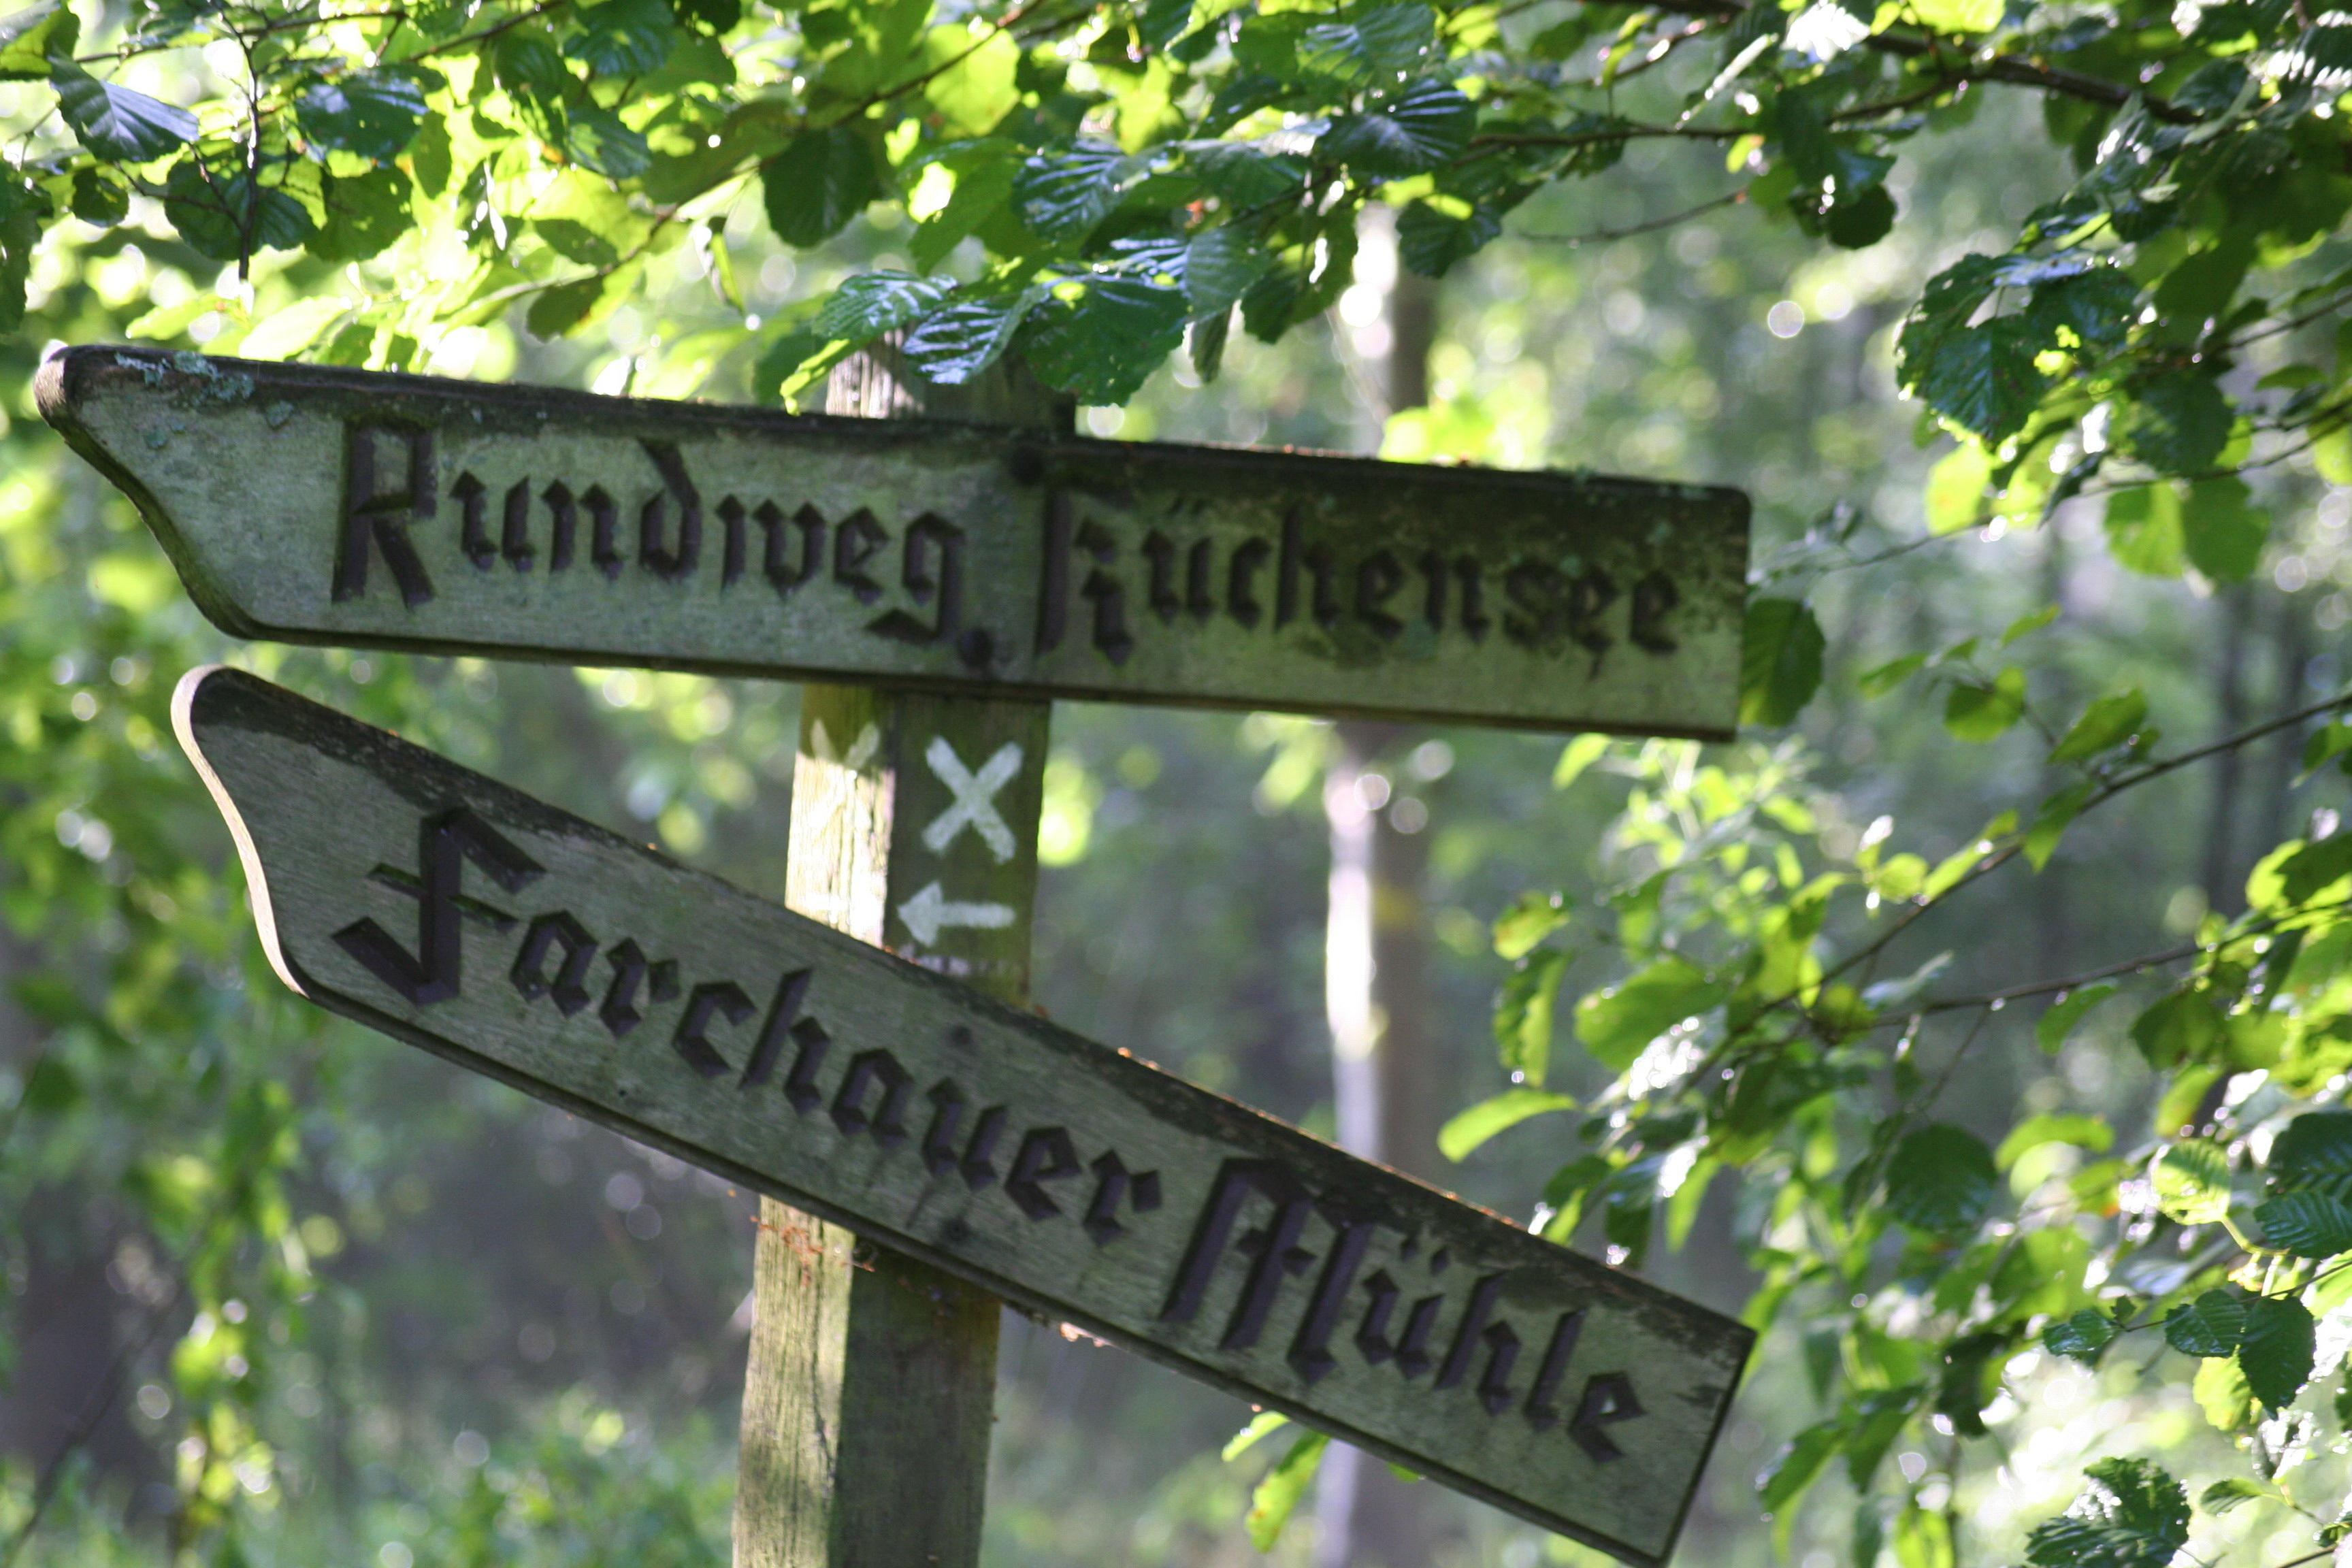 Viele Wege führen nach Farchau